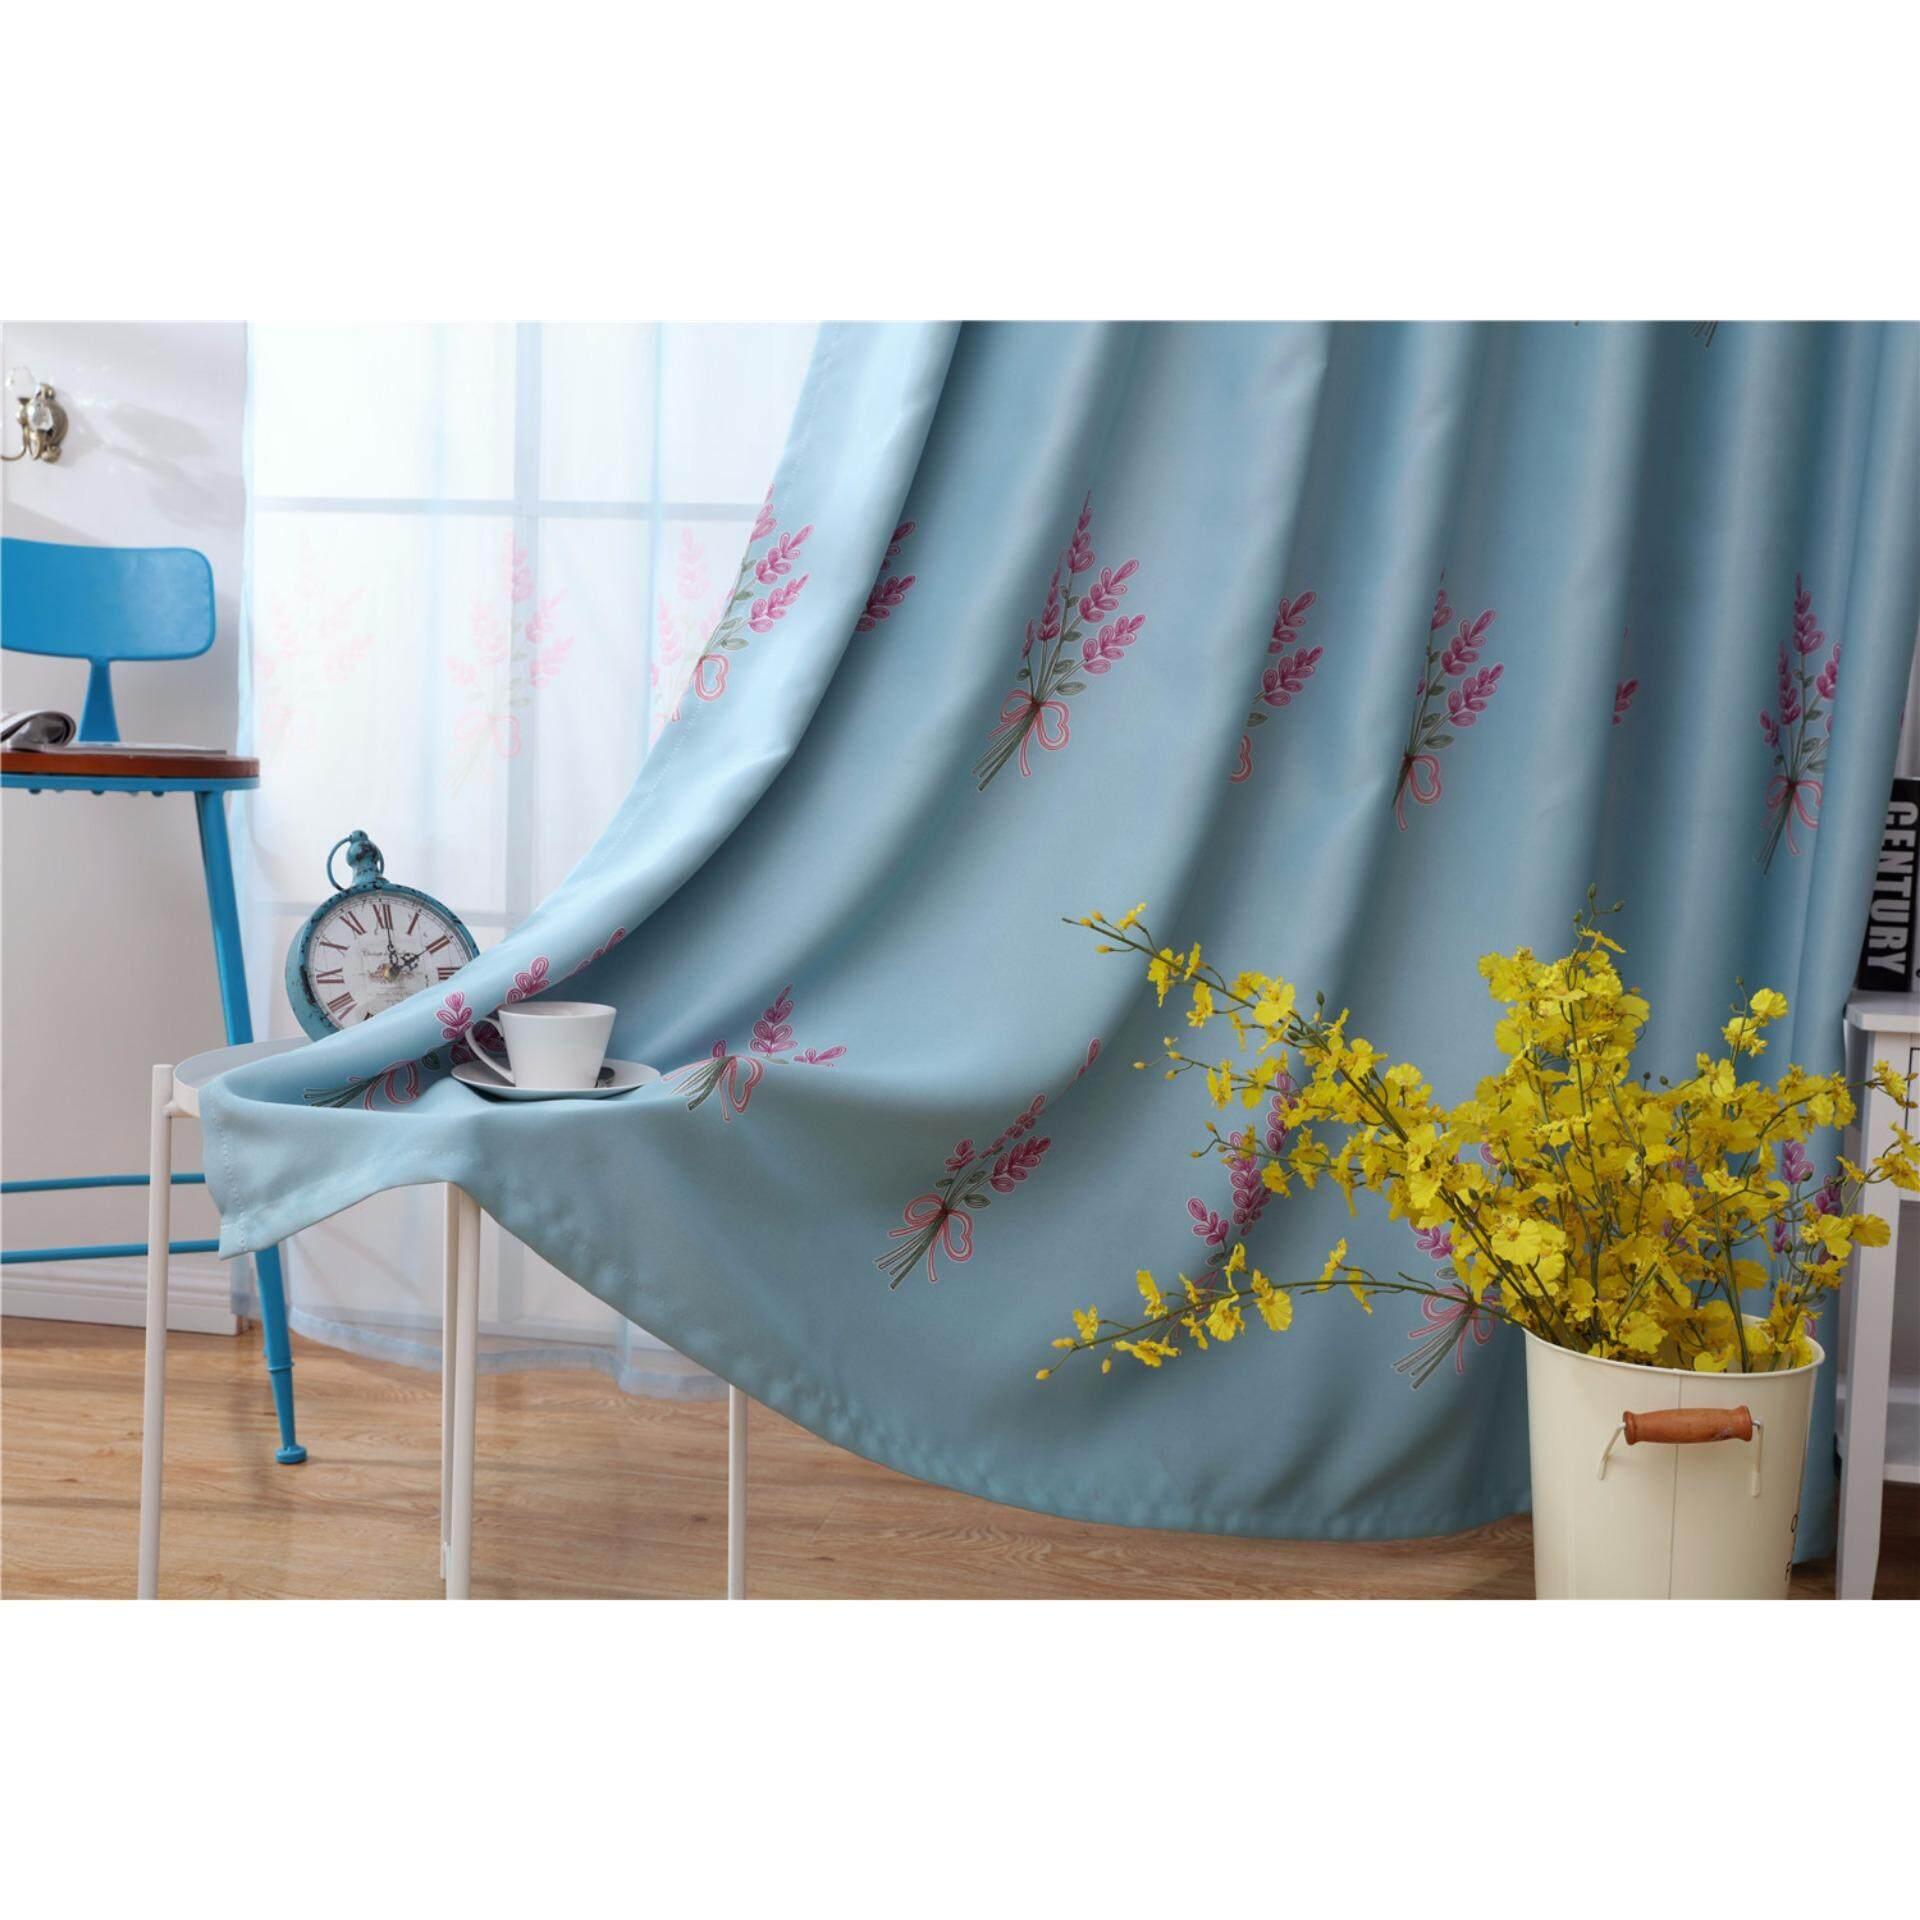 Yika Sun Insulation Curtains Lavender Pattern Curtains ... - photo#39